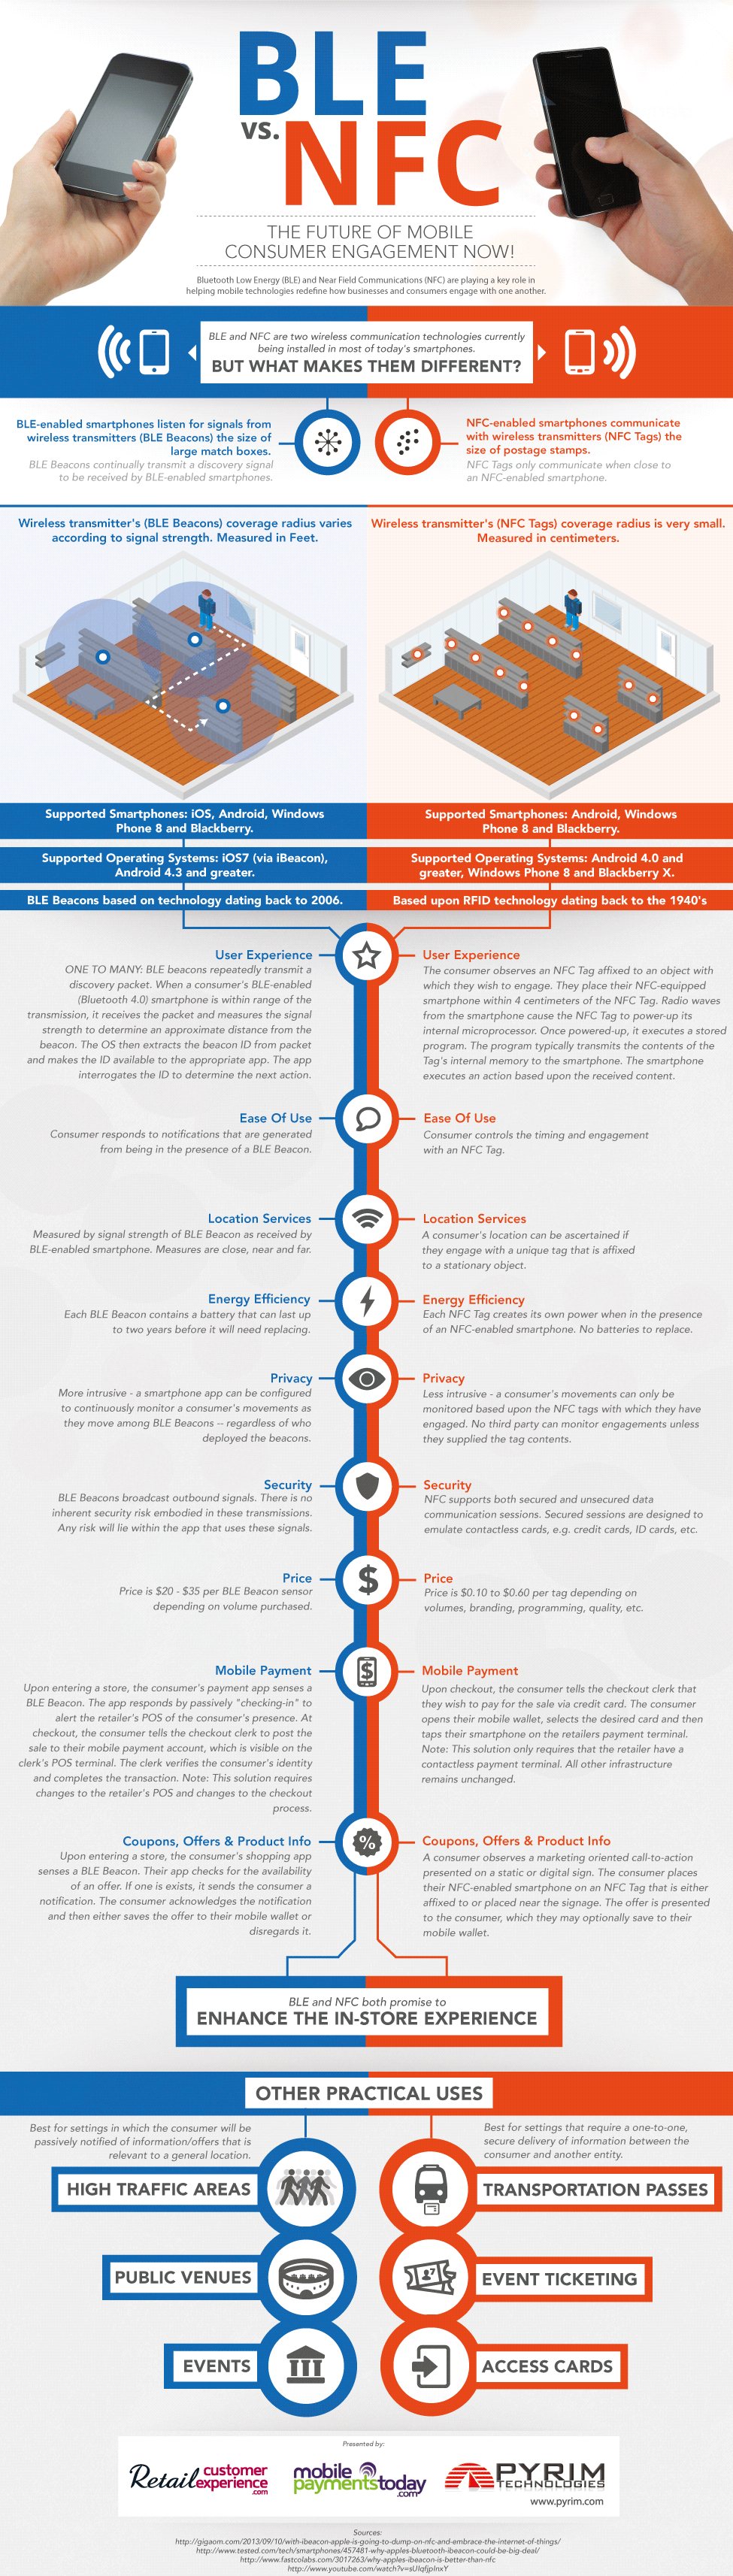 BLE-vs-NFC-infographic